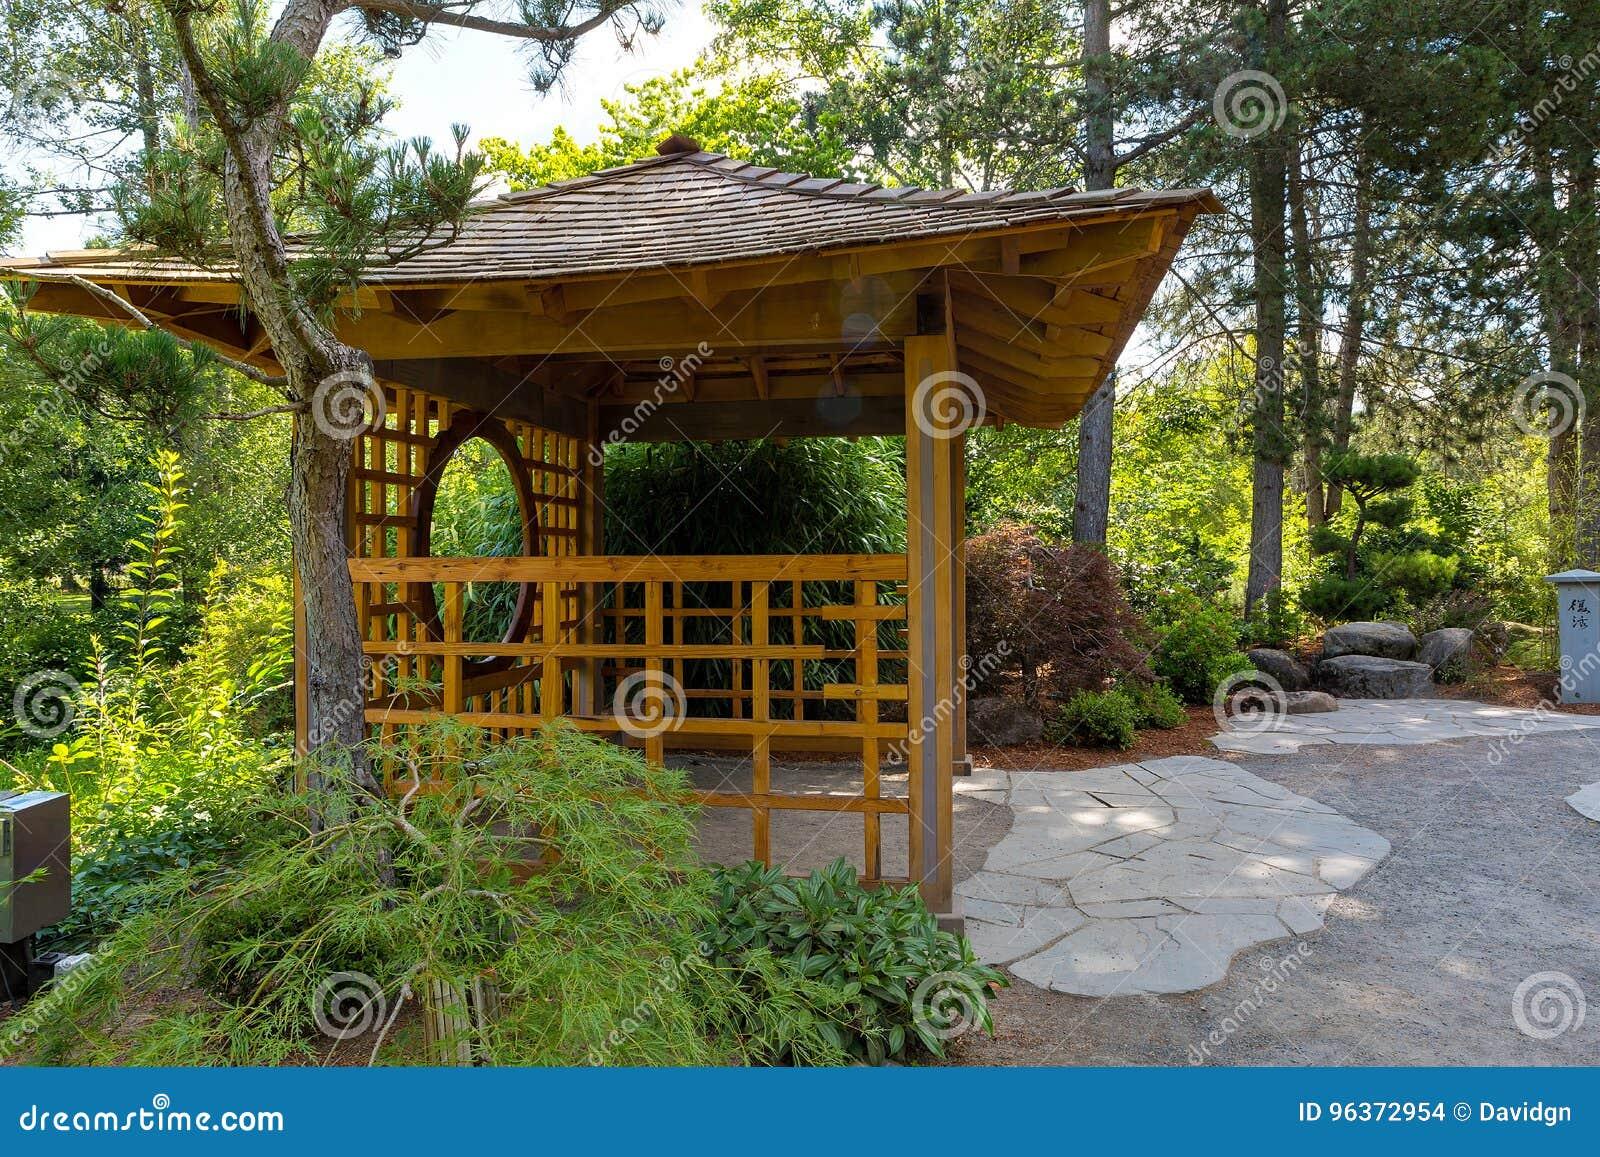 Wooden Gazebo At Tsuru Island Japanese Garden Stock Photo - Image of ...